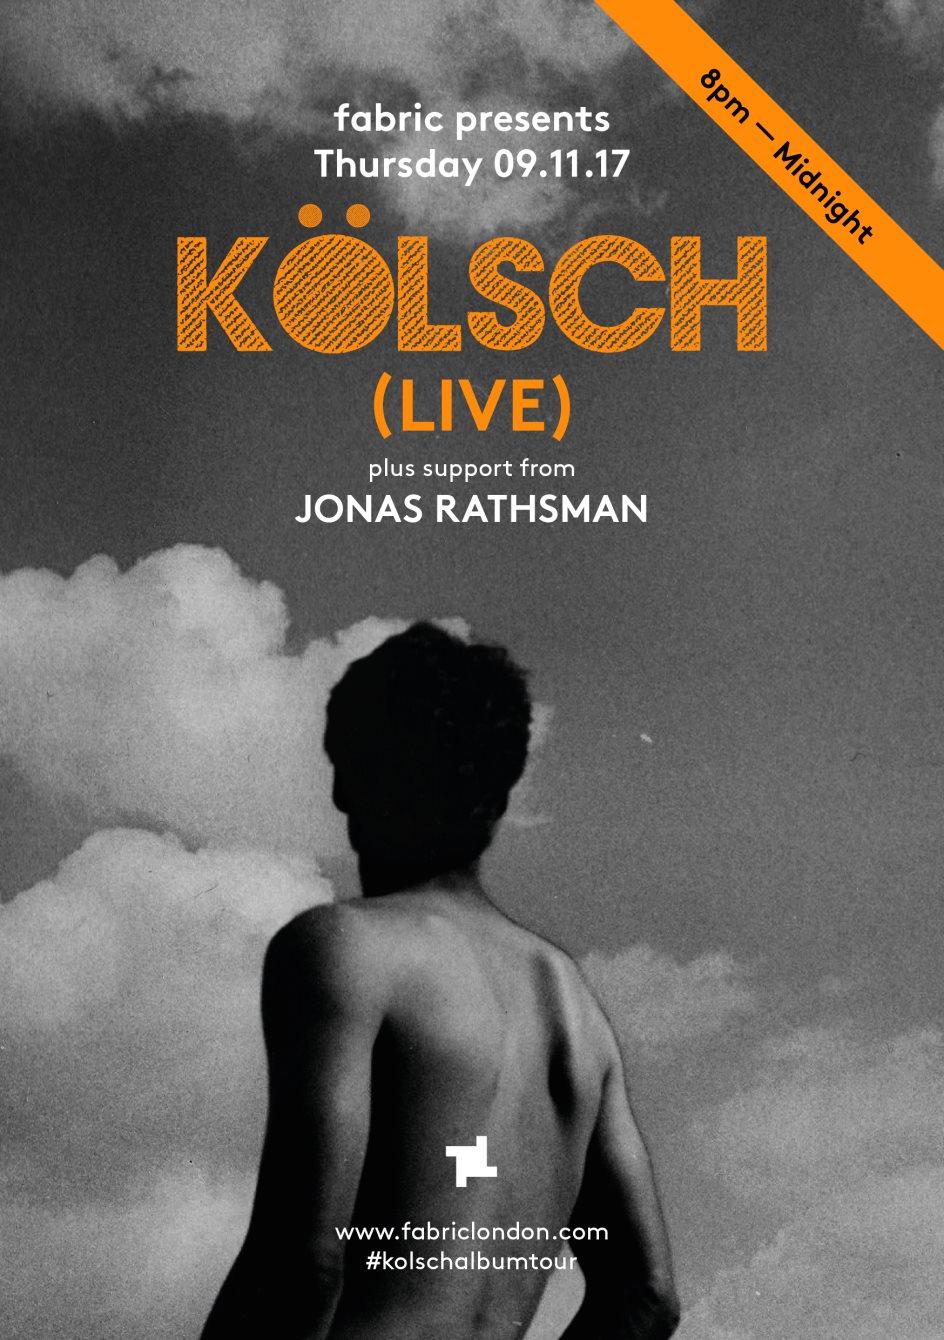 fabric presents: Kolsch (Live) - Flyer back